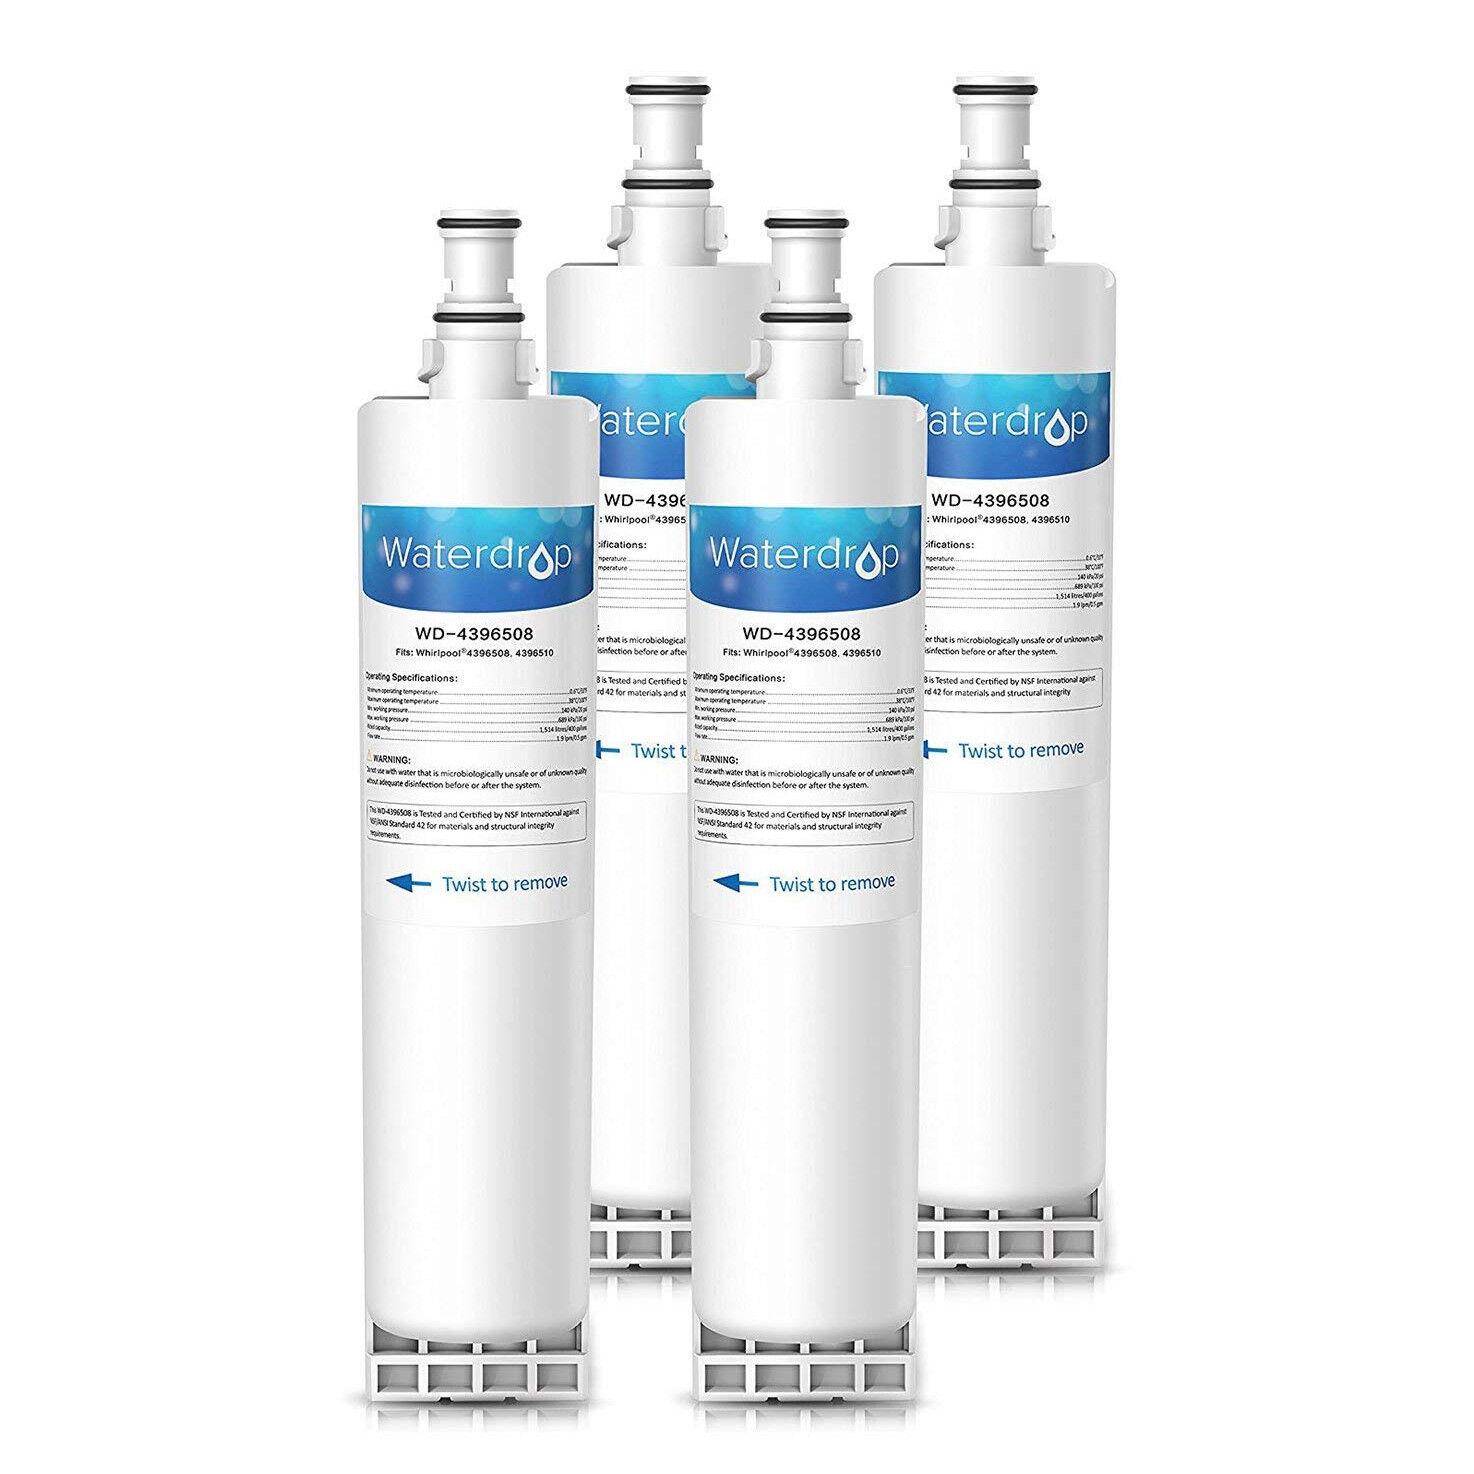 4 Waterdrop Kühlschrank Filter kompatibel mit Whirlpool SBS200, 484000008726